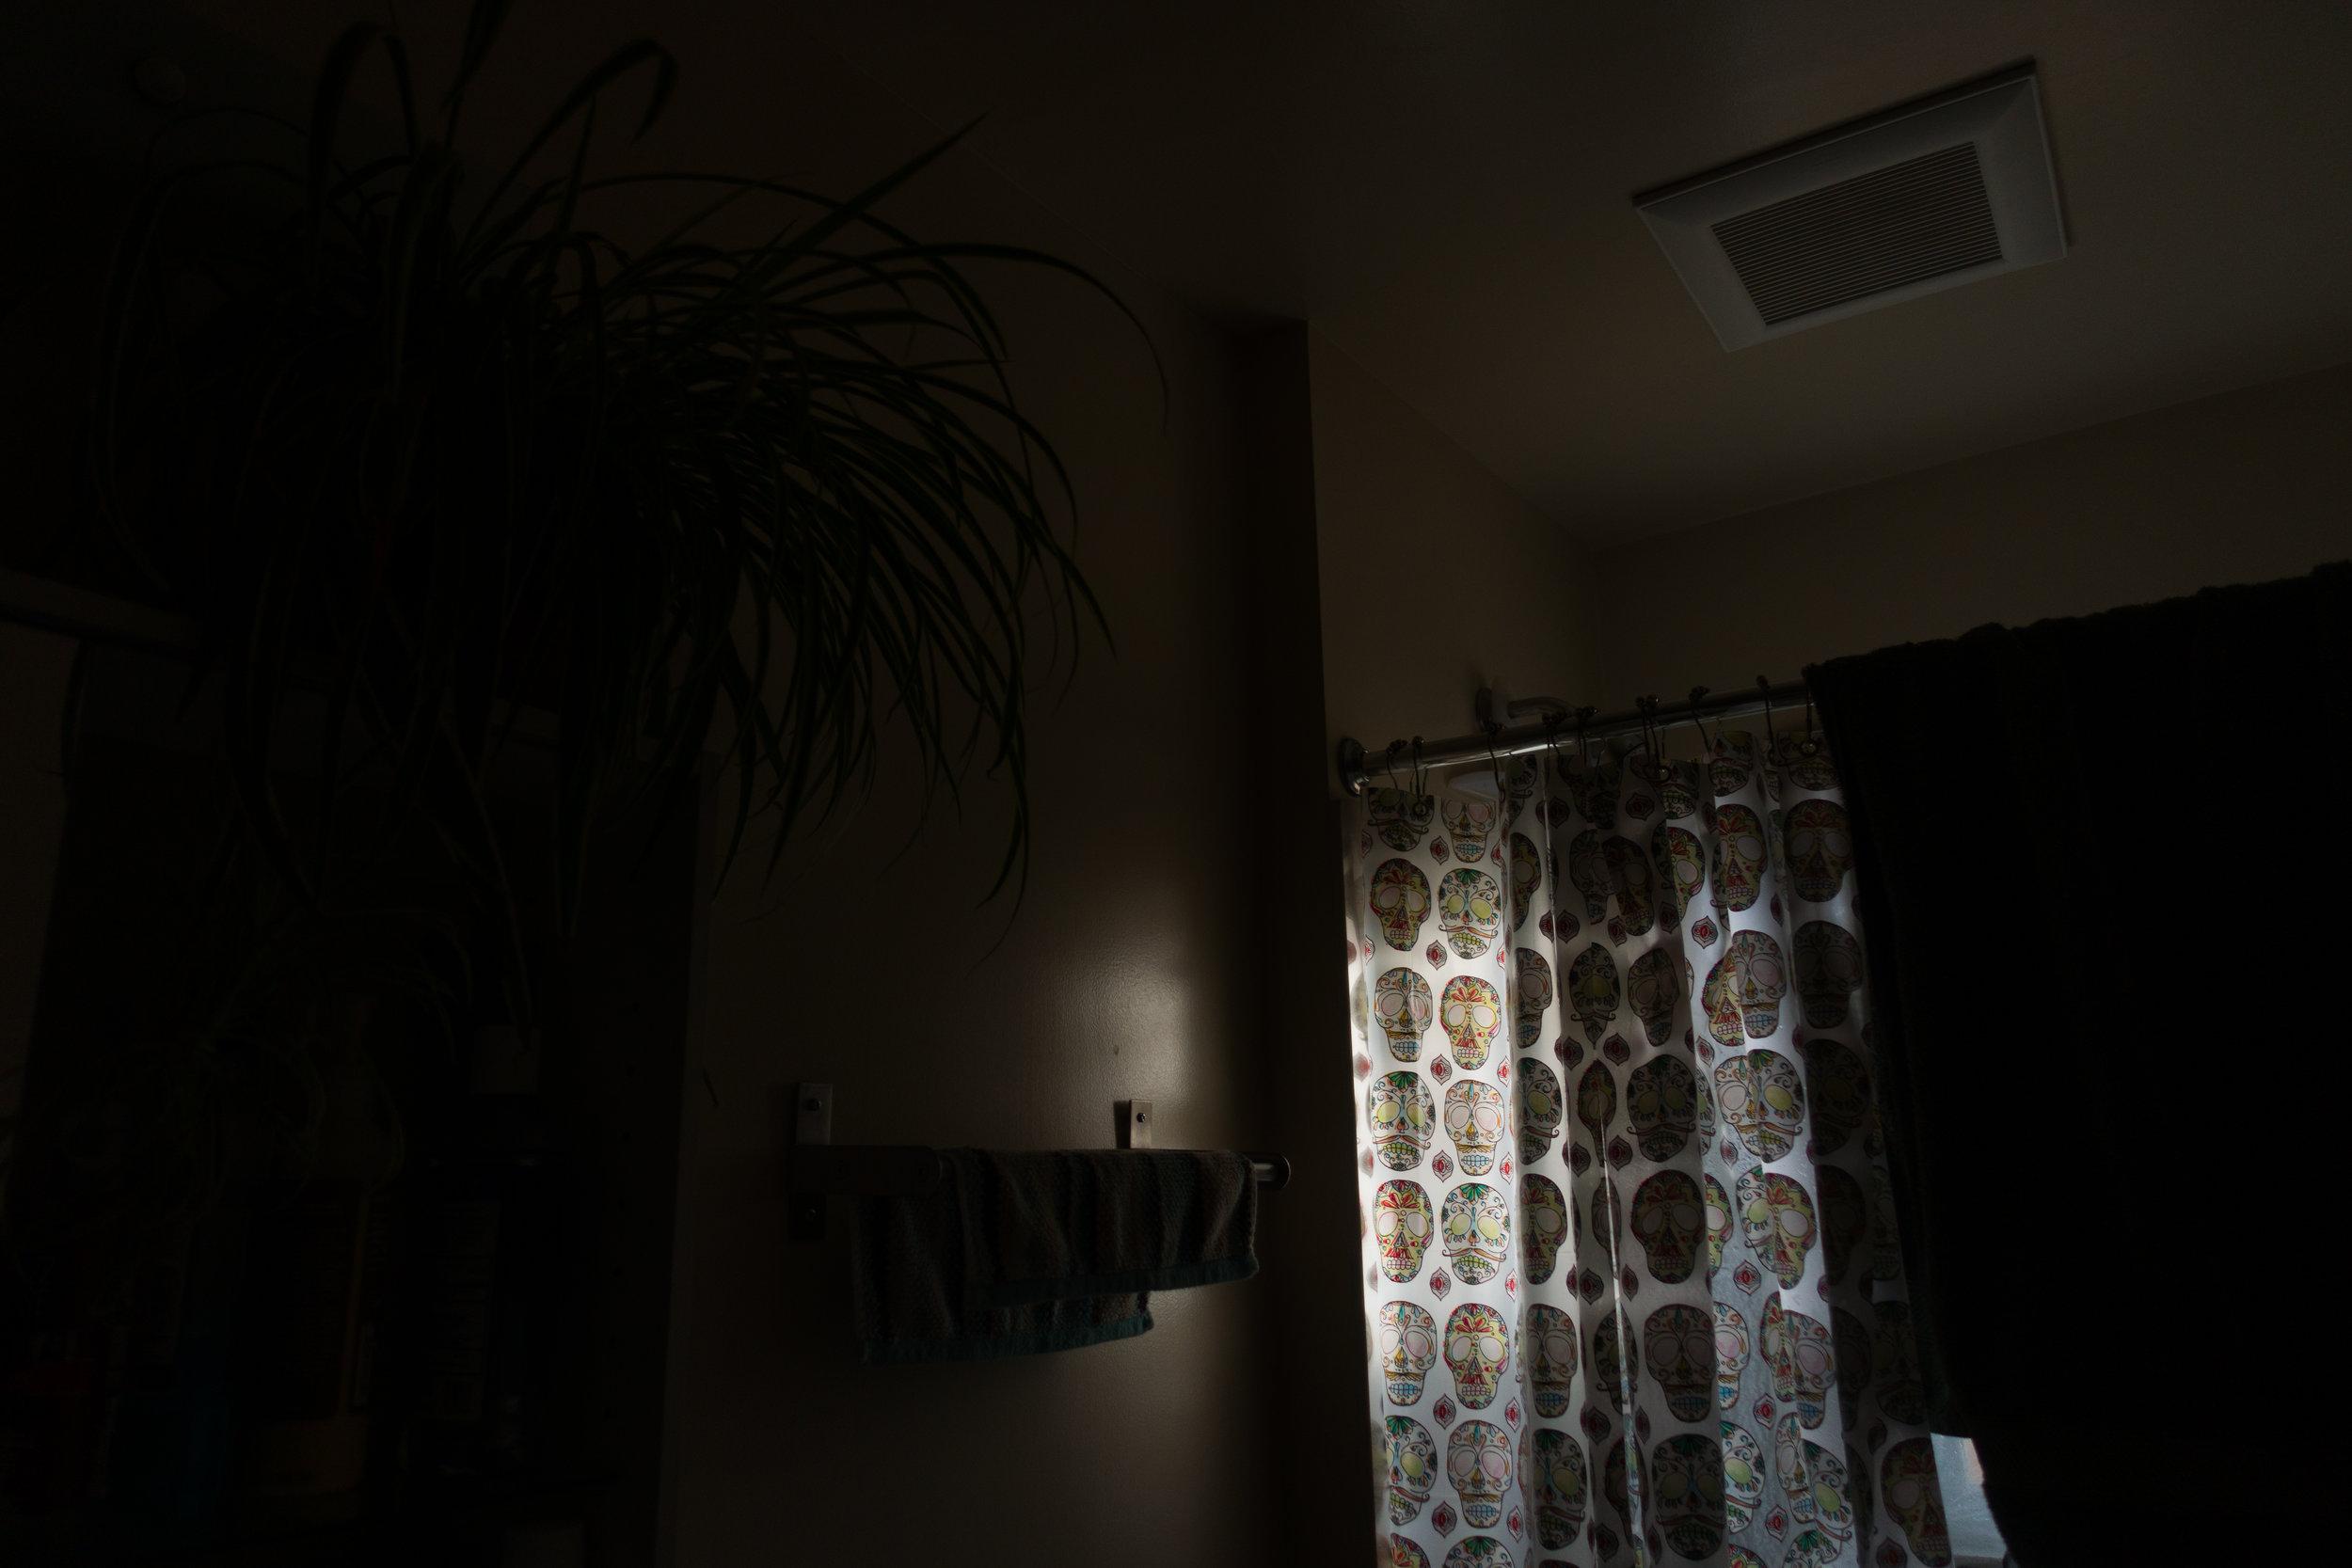 20180326-shadow_and_light-001.jpg